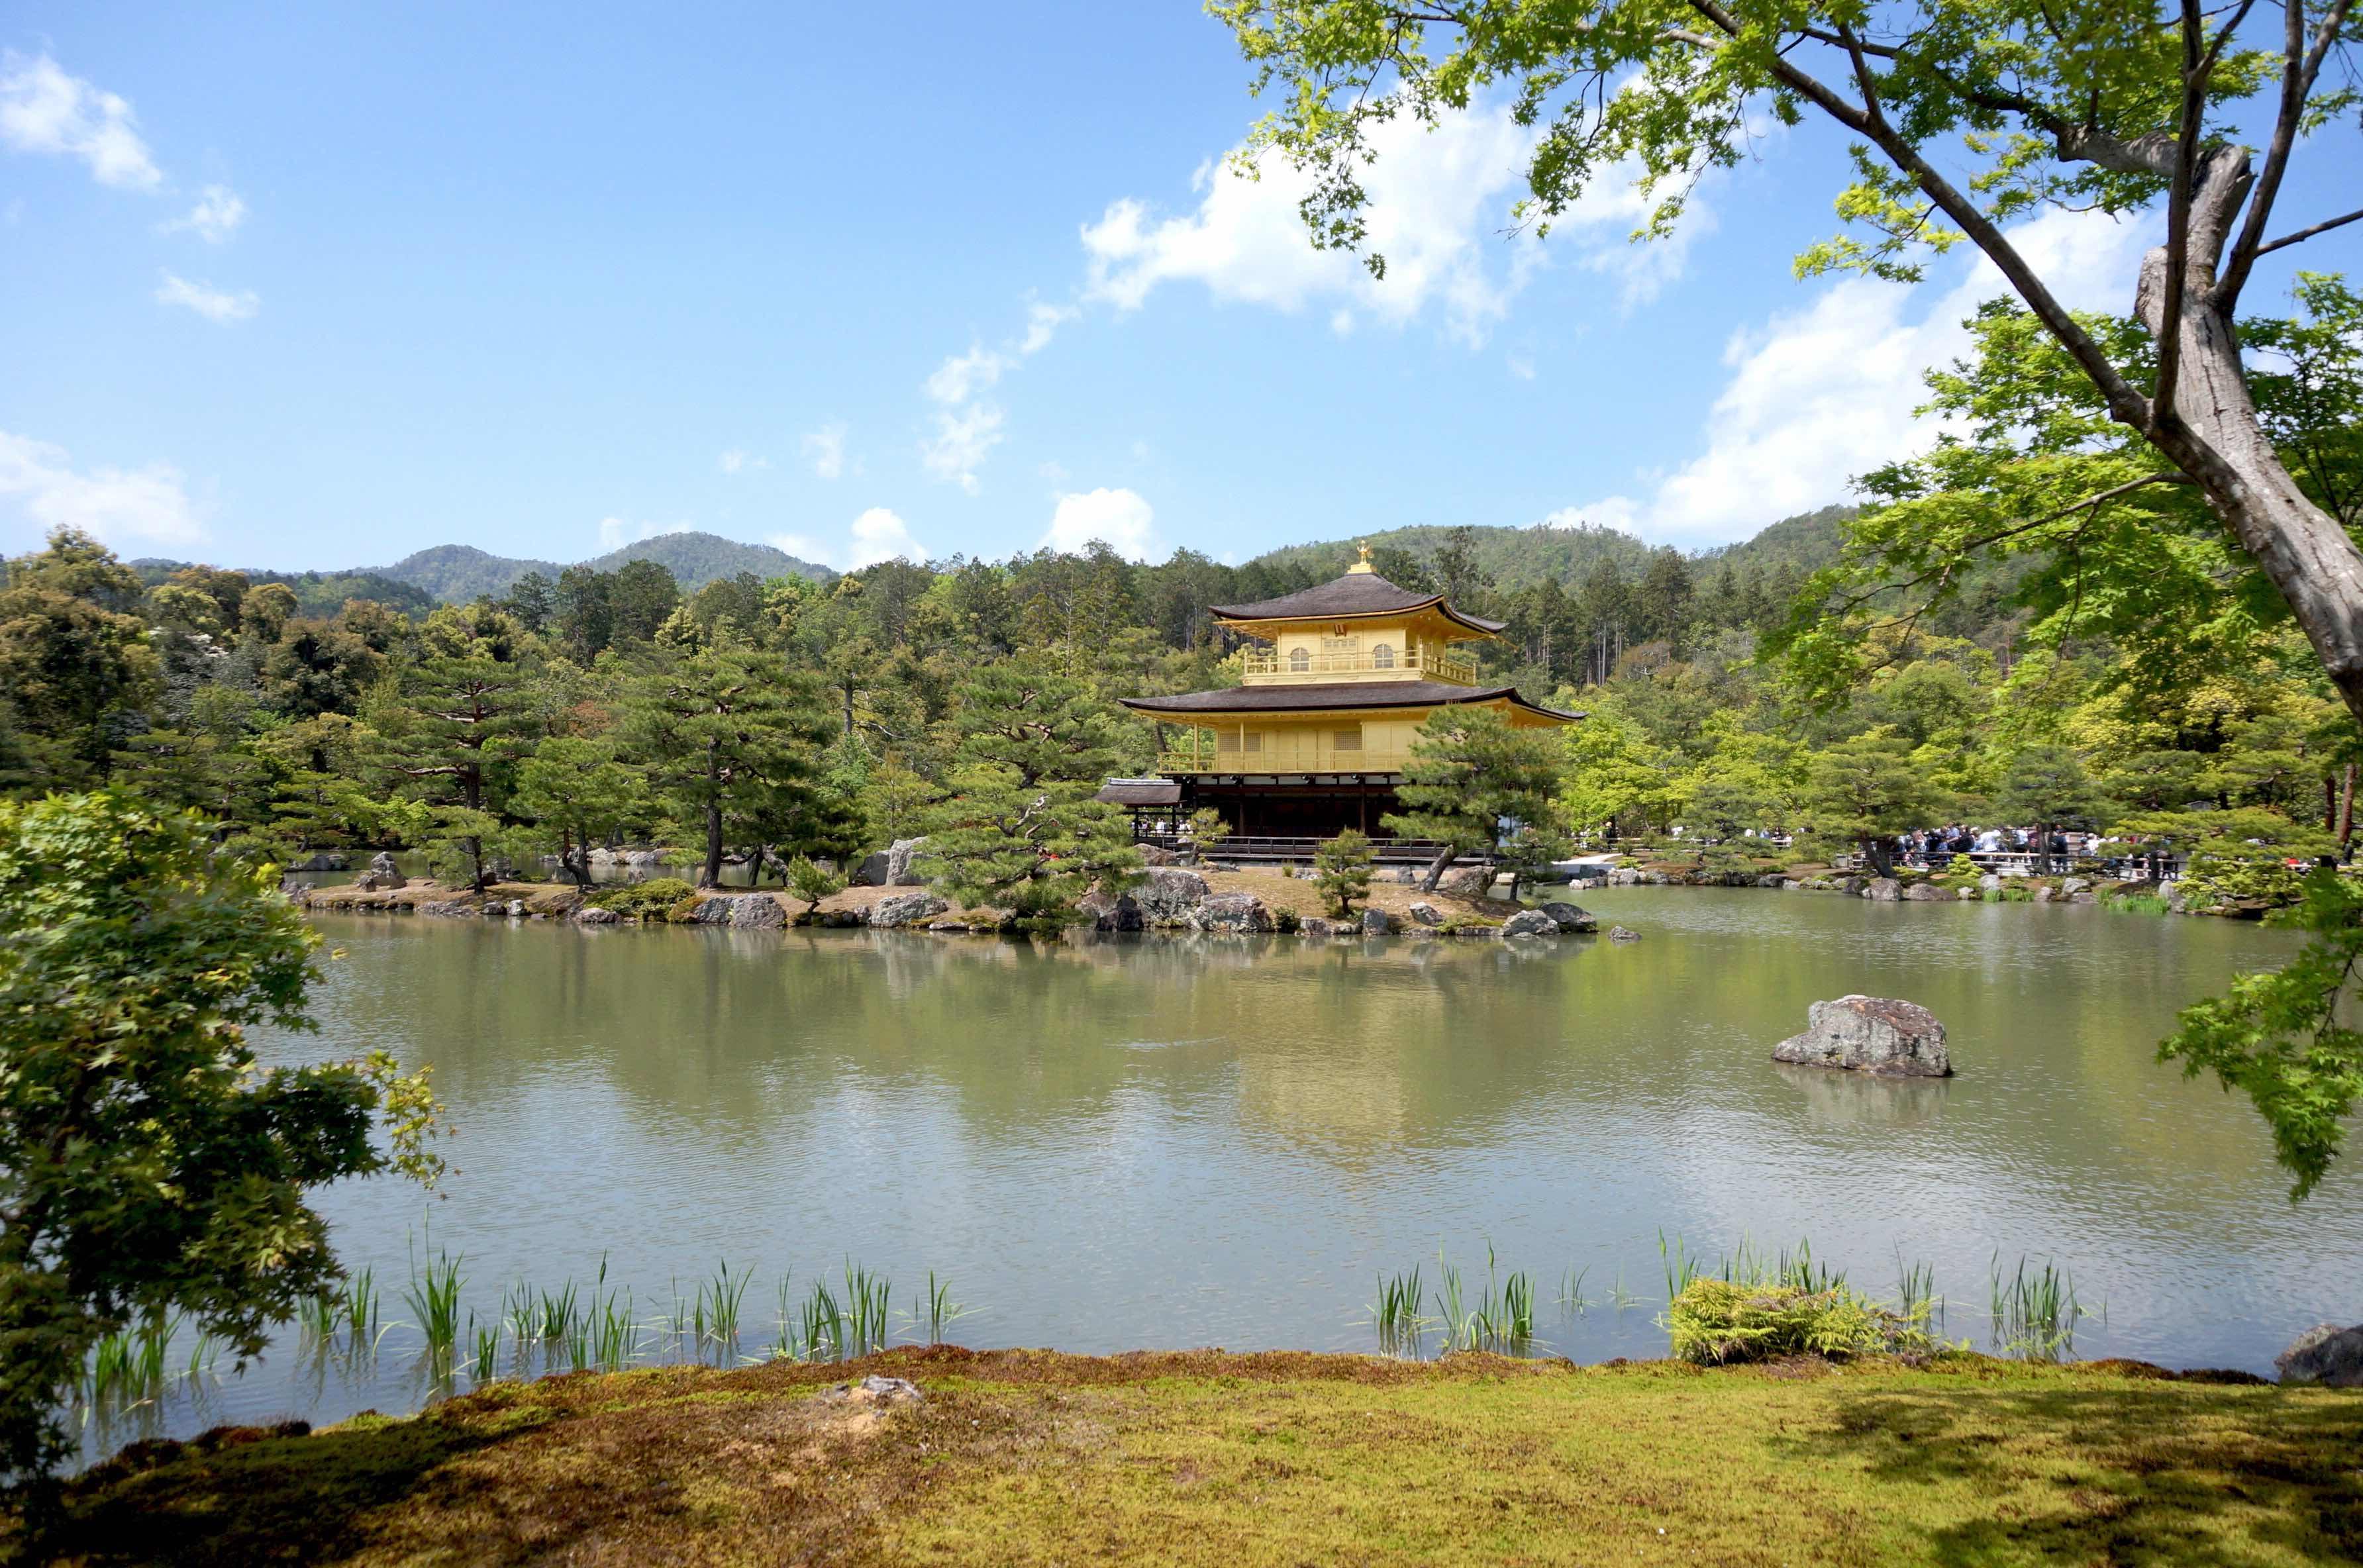 pavillon d'or, kinkaku-ji, kyoto, japon